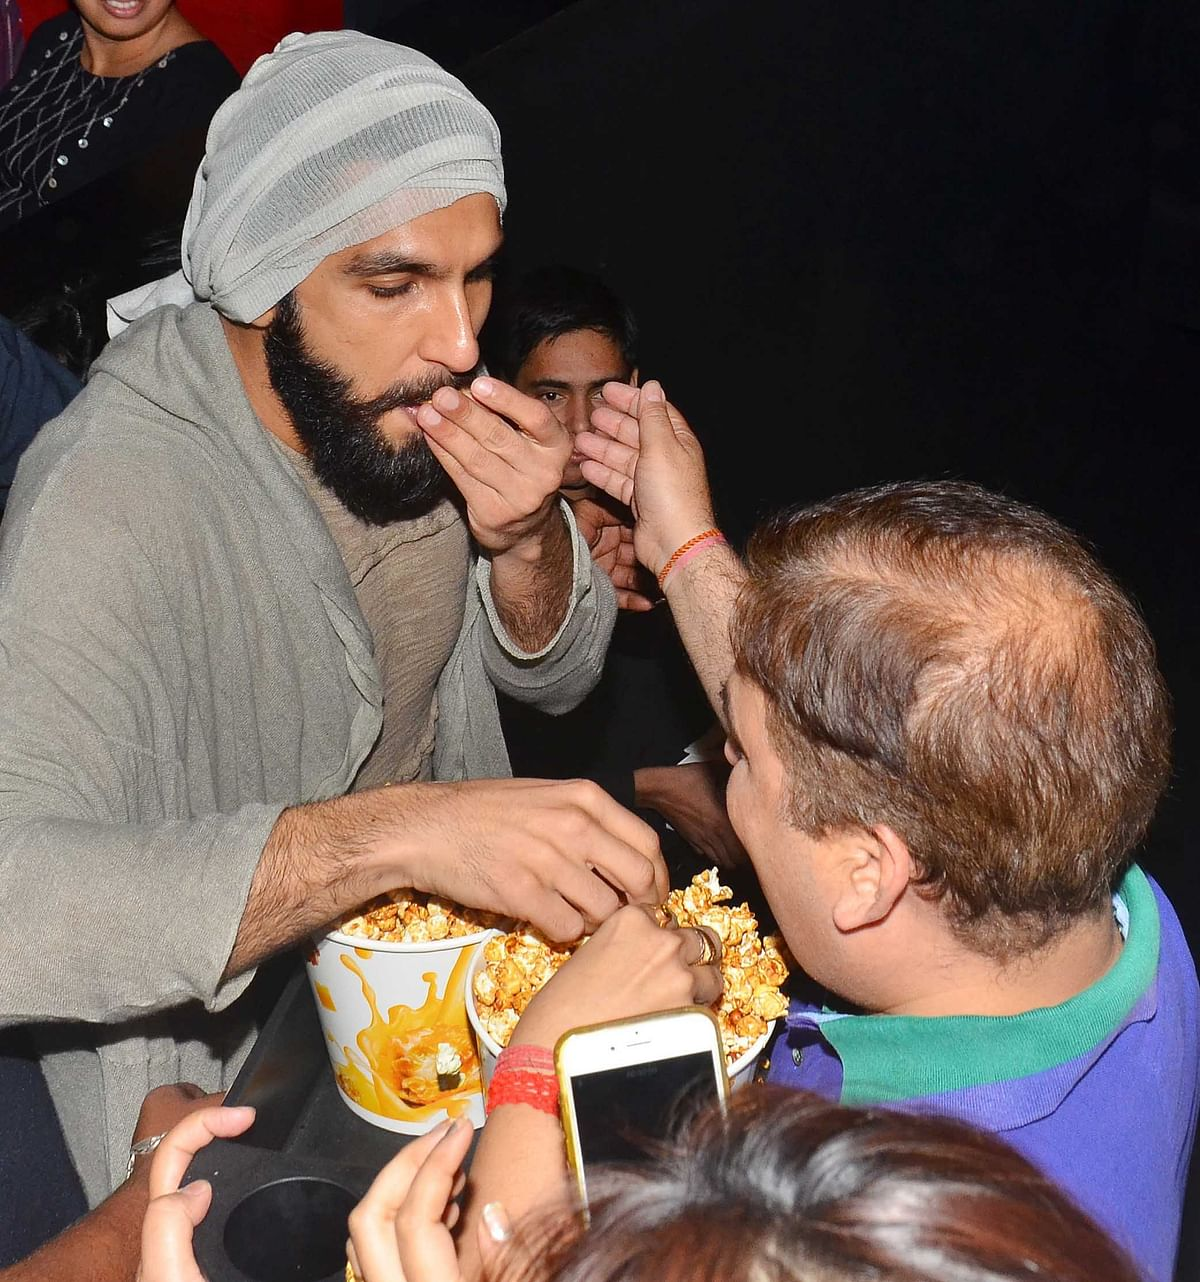 Ranveer also steals popcorn from fans. (Photo: Yogen Shah)